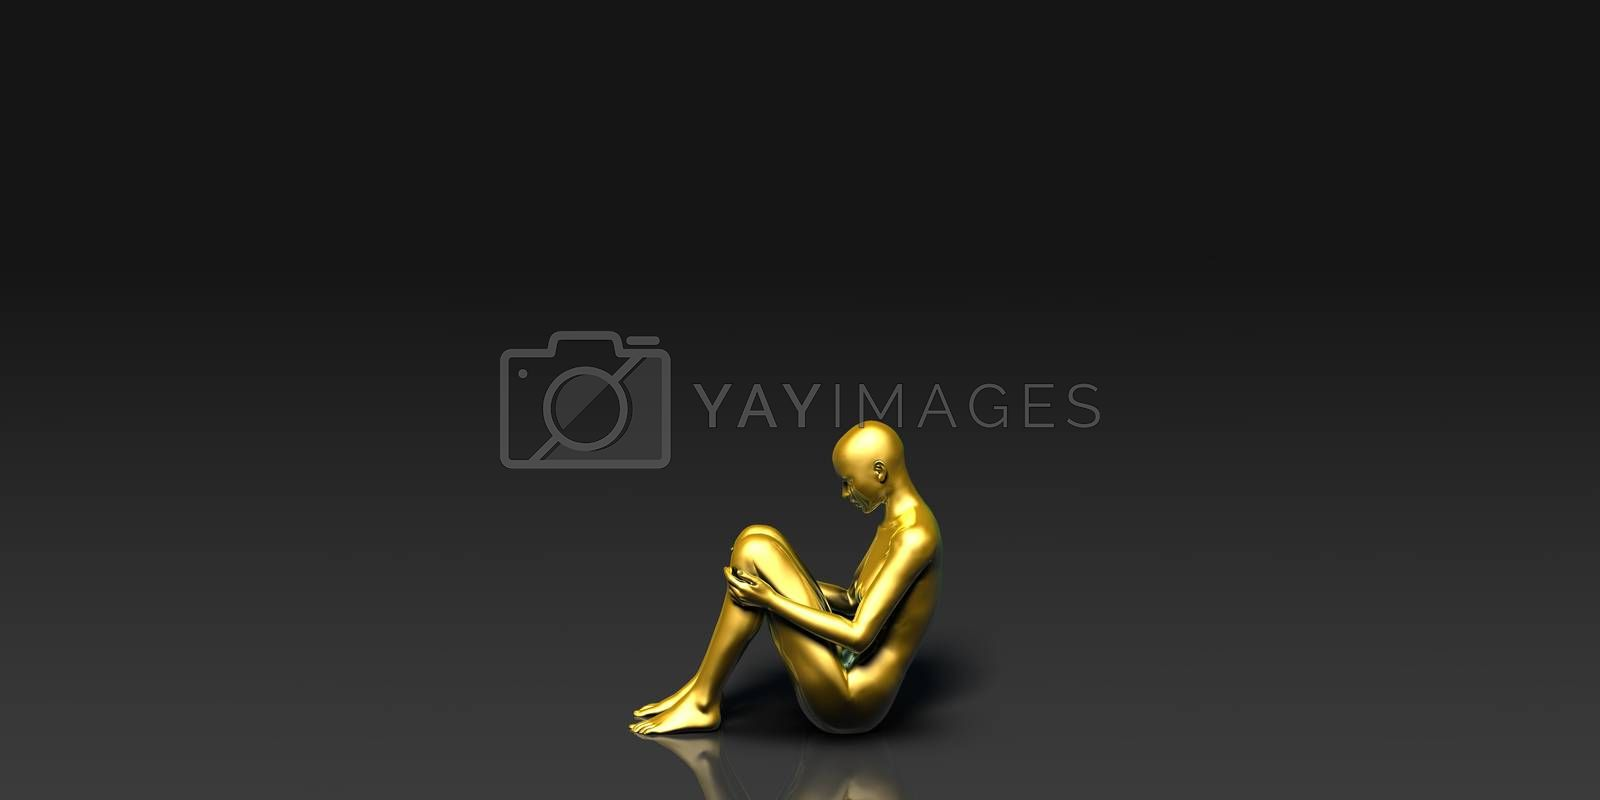 Yoga Pose, the Fetal Comfort Basic Poses Guide